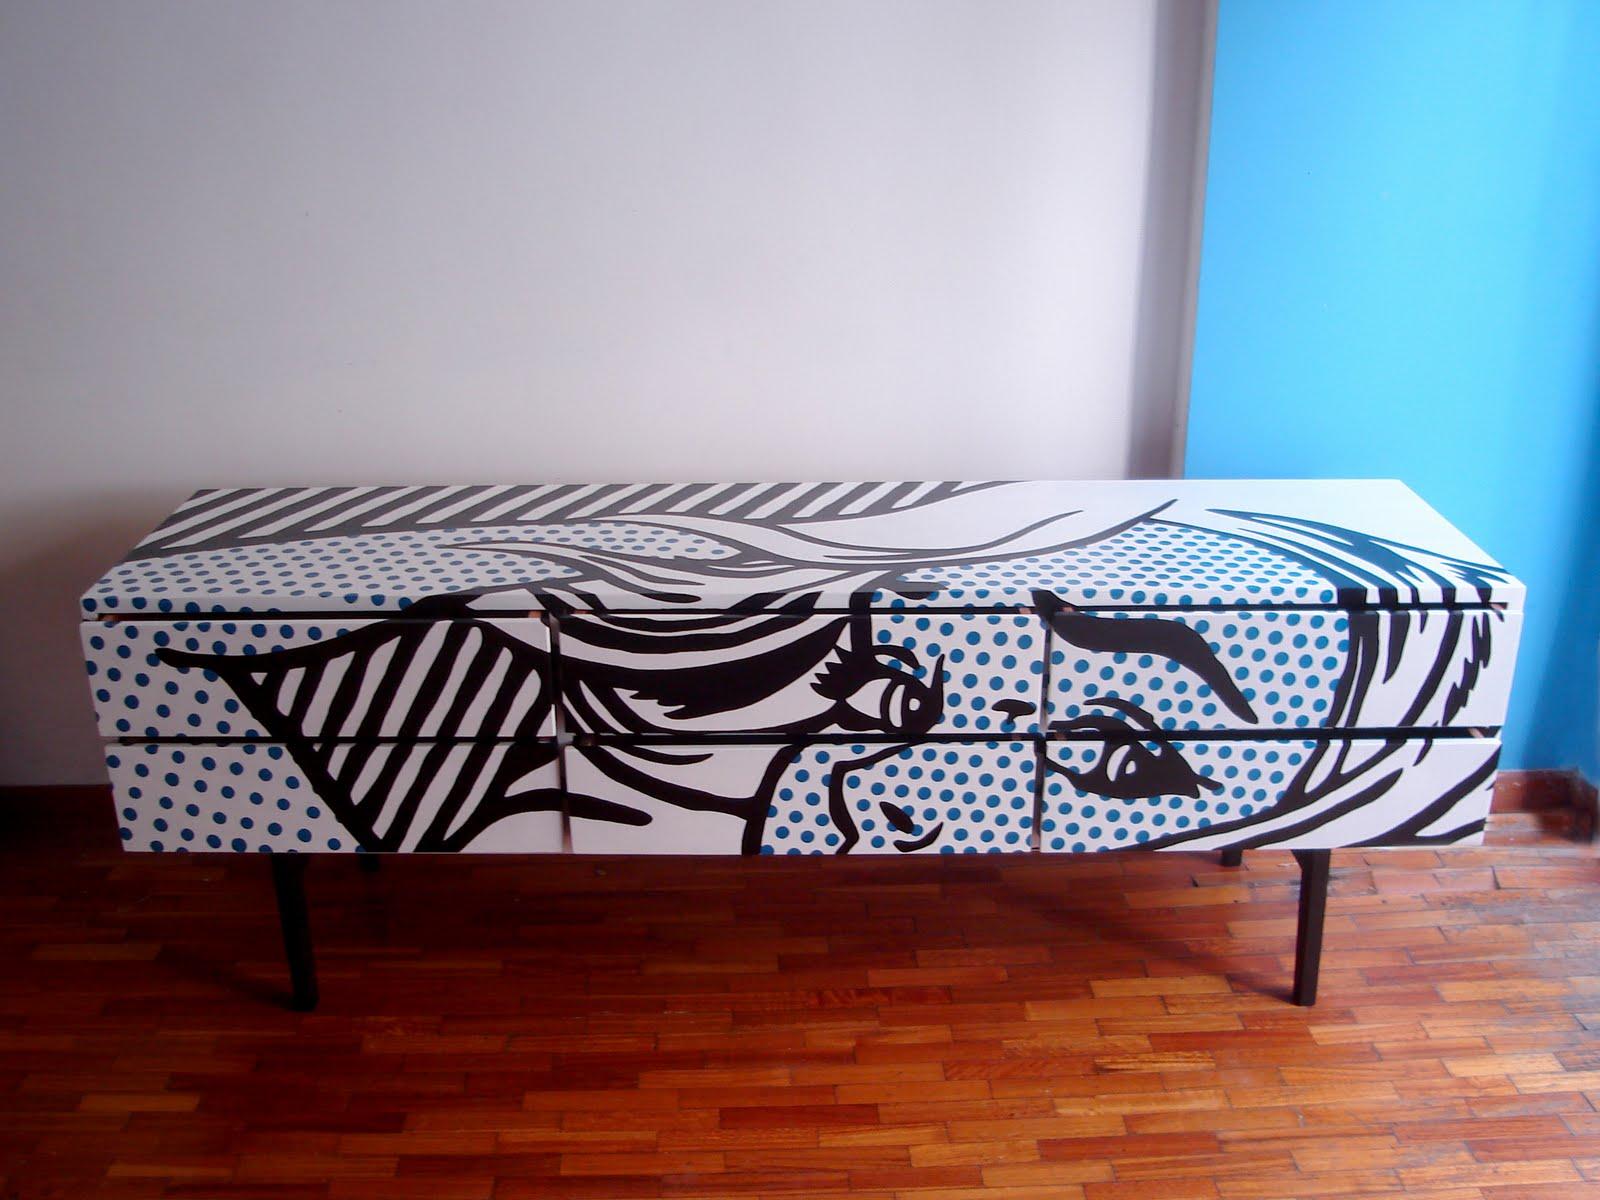 Xamoralarte muebles intervenidos ponele arte a tu vida for Muebles pop art